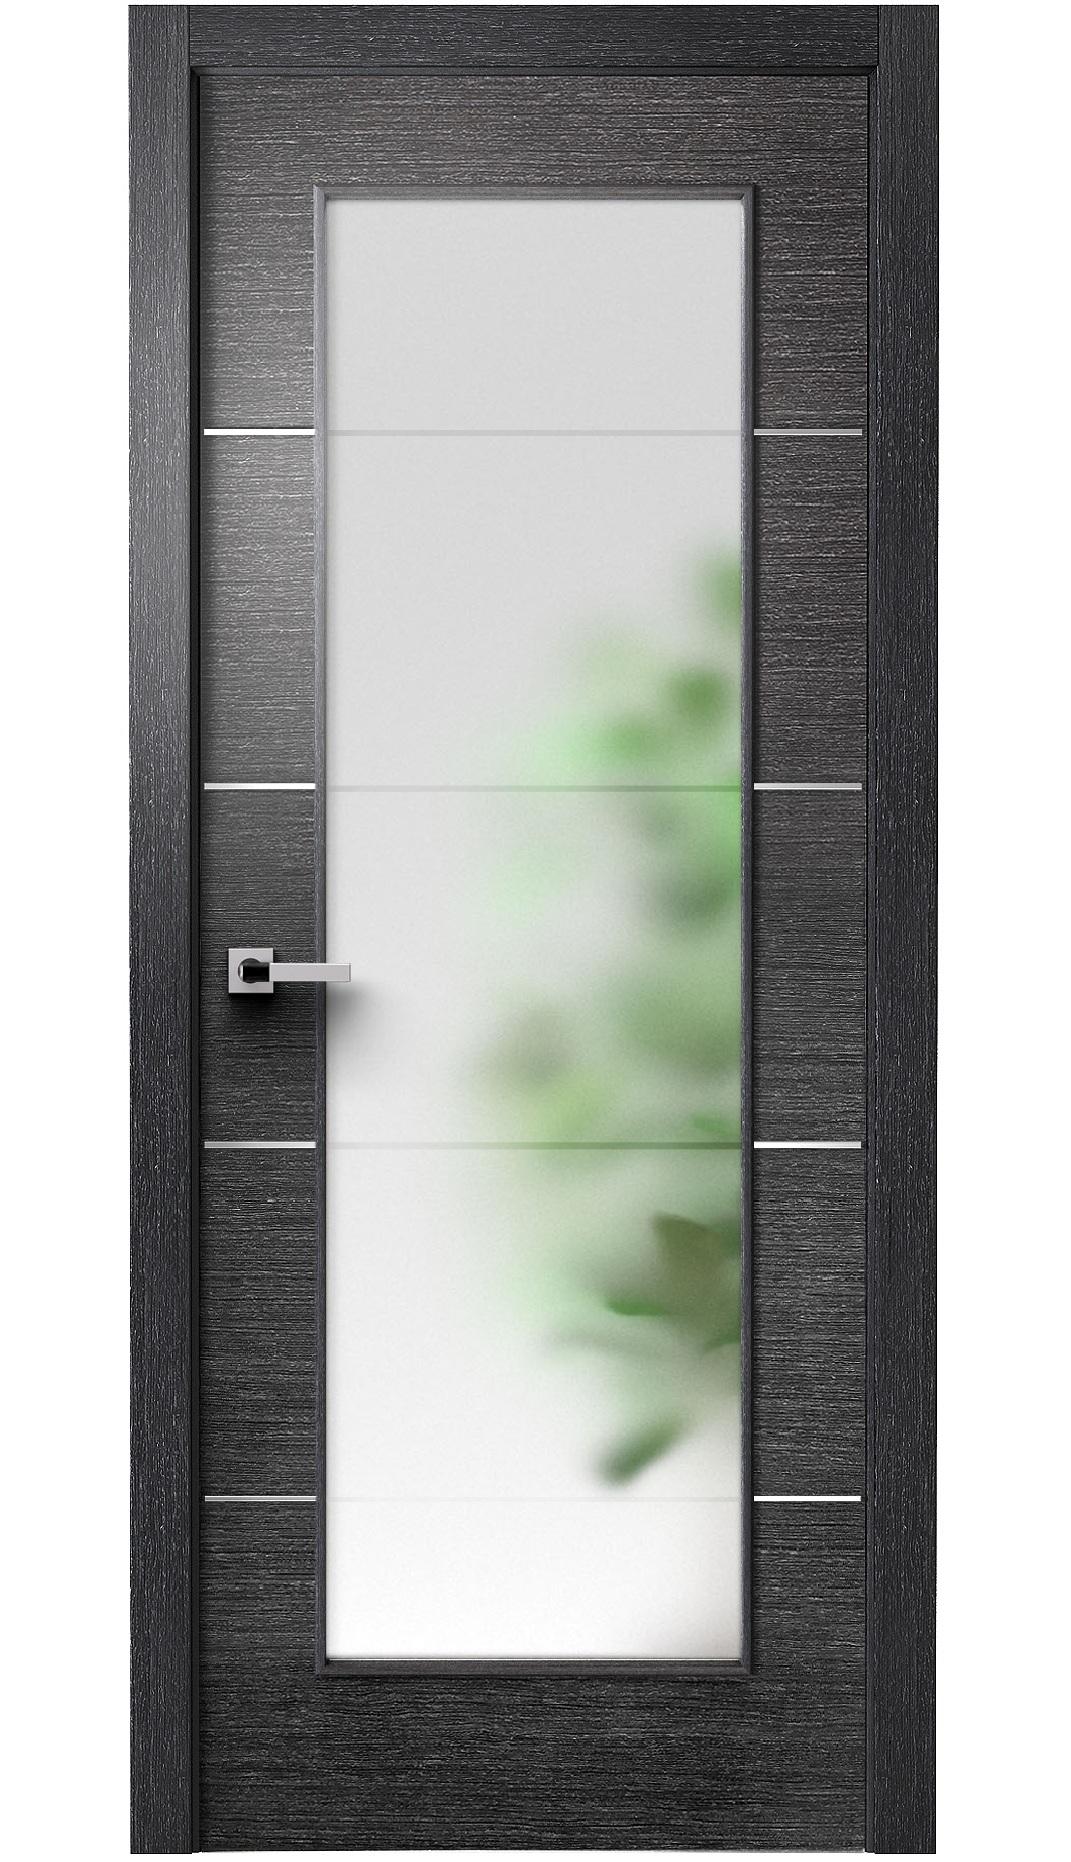 Image Versa Vetro Interior Door Black Apricot 0